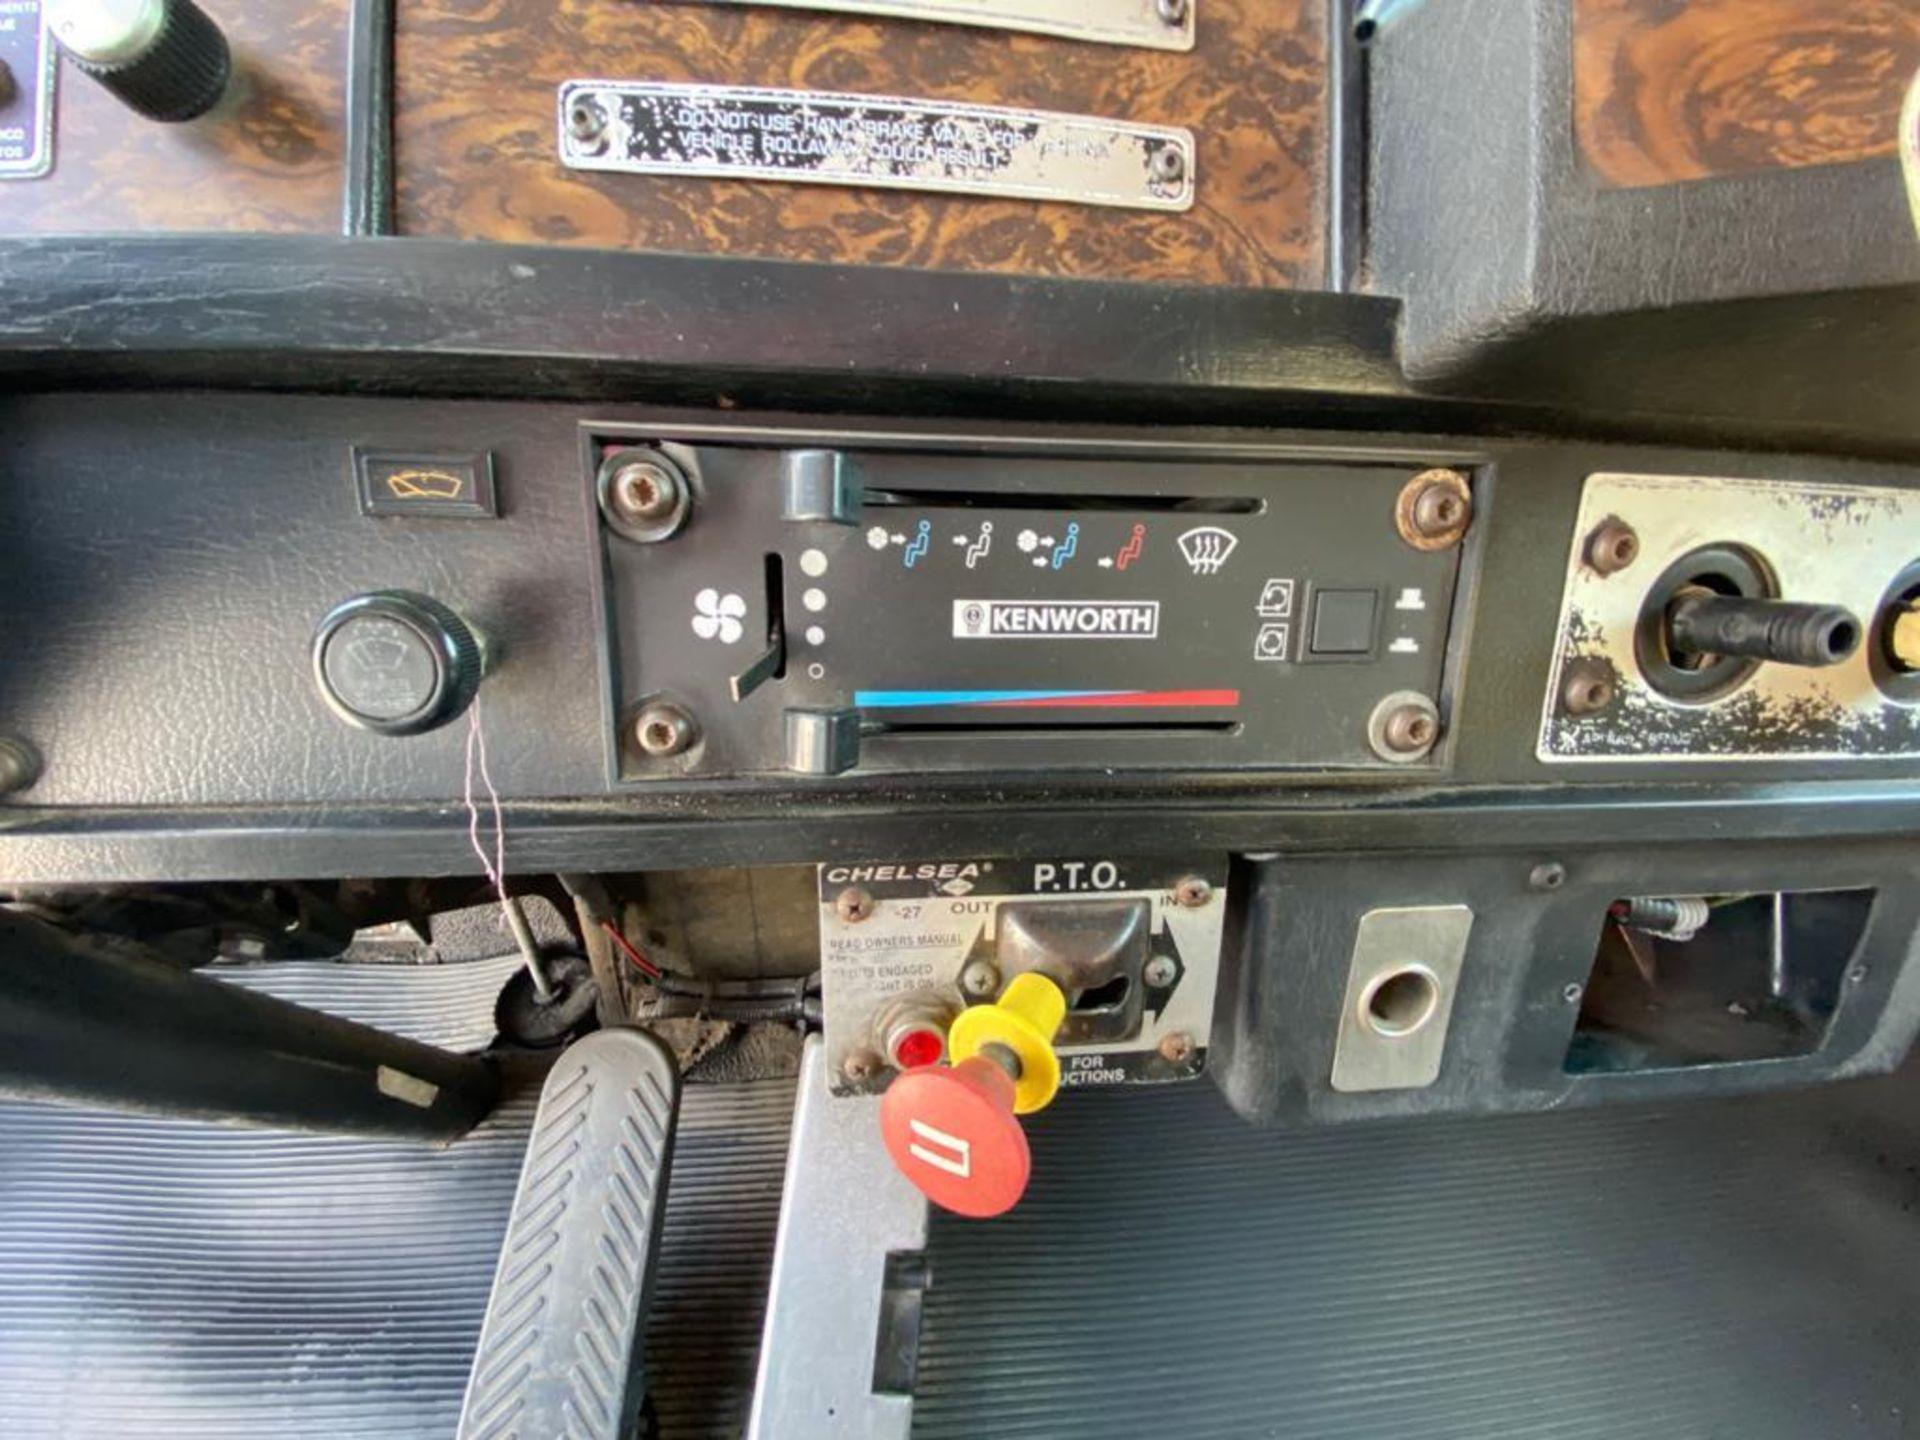 1998 Kenworth Sleeper truck tractor, standard transmission of 18 speeds - Image 40 of 75